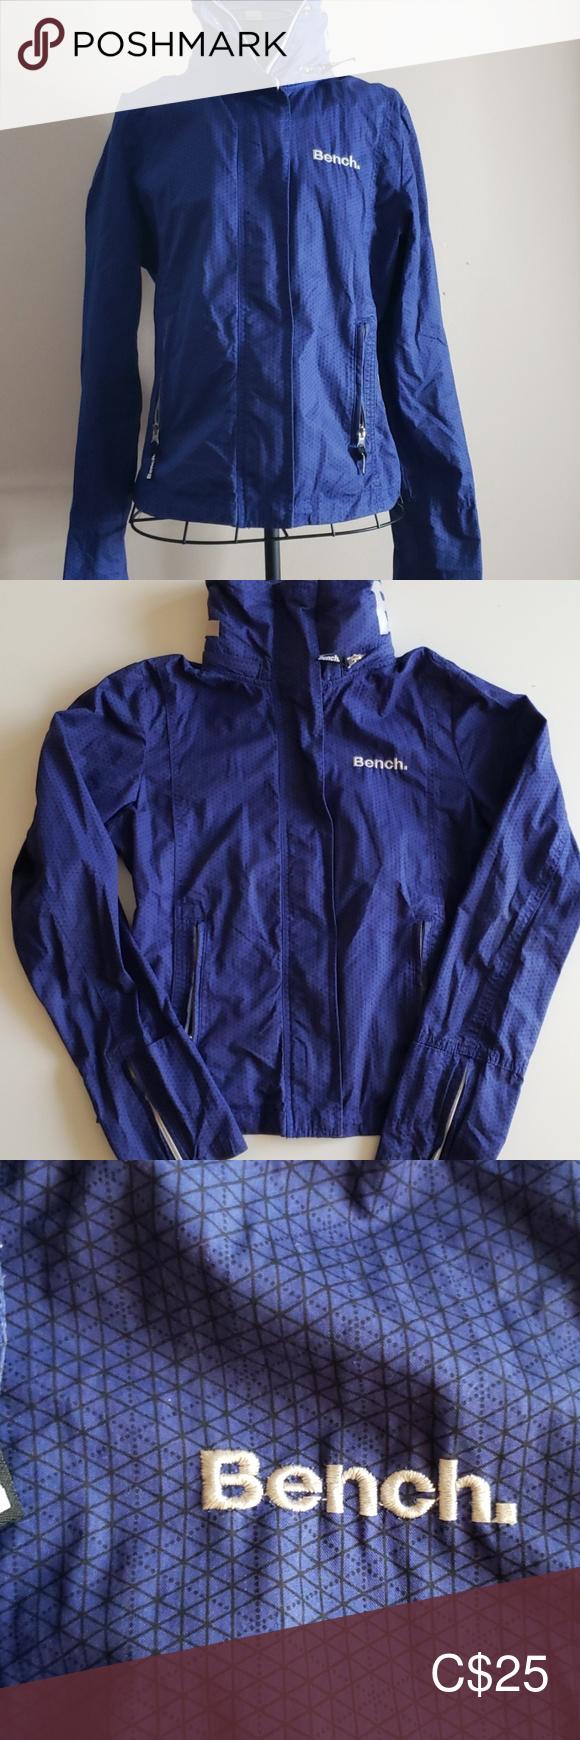 Women S Blue Bench Jacket Size Medium Bench Jackets Jackets Jackets For Women